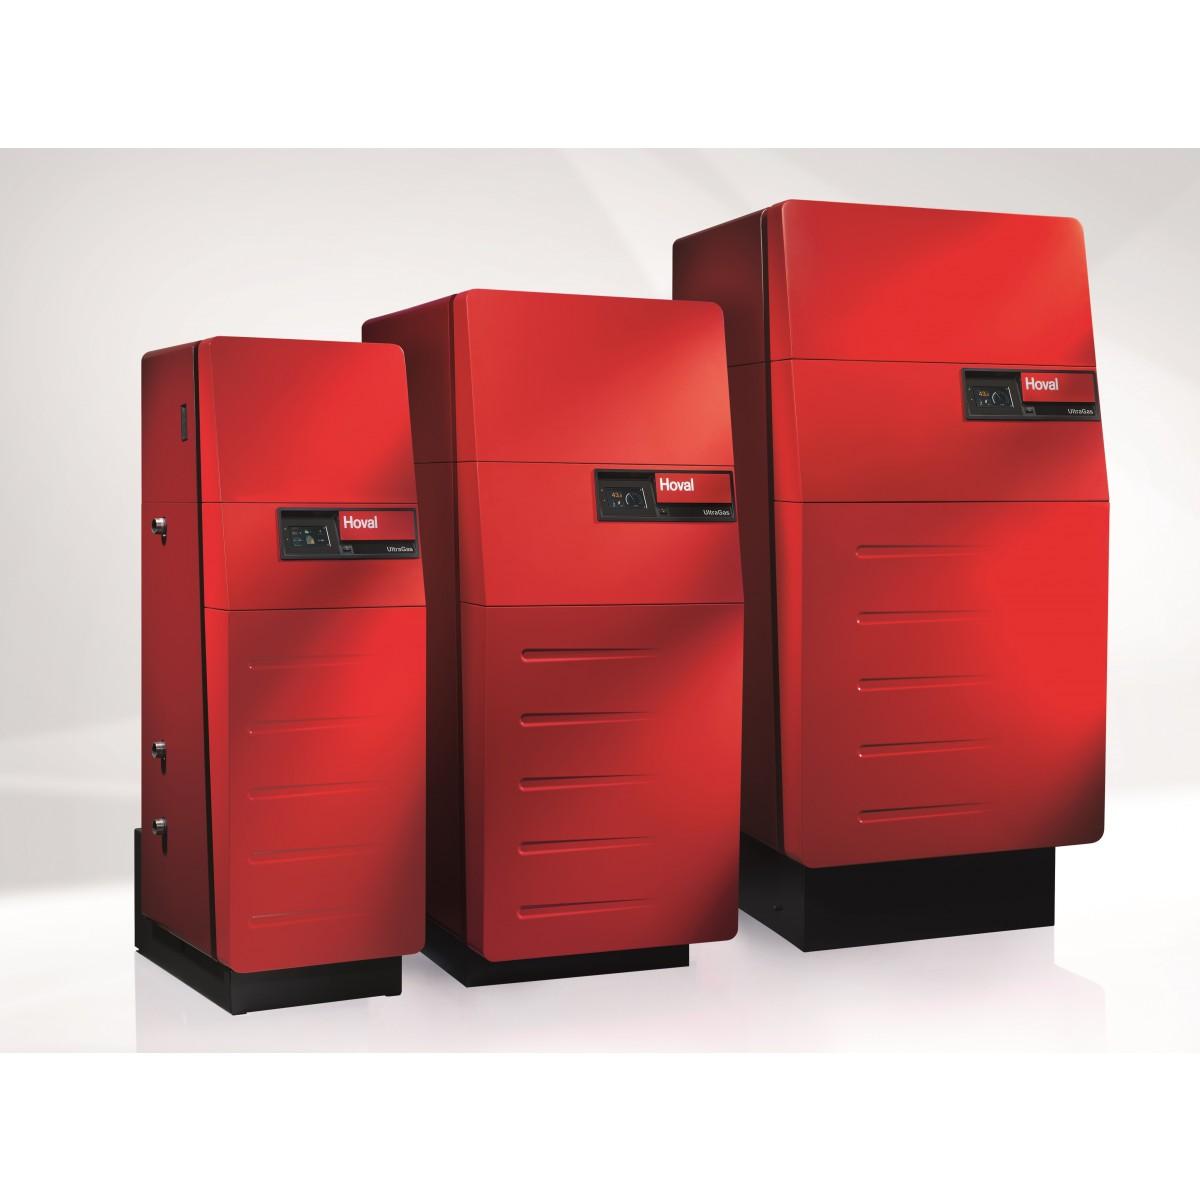 chaudi re gaz condensation hoval ultragas. Black Bedroom Furniture Sets. Home Design Ideas